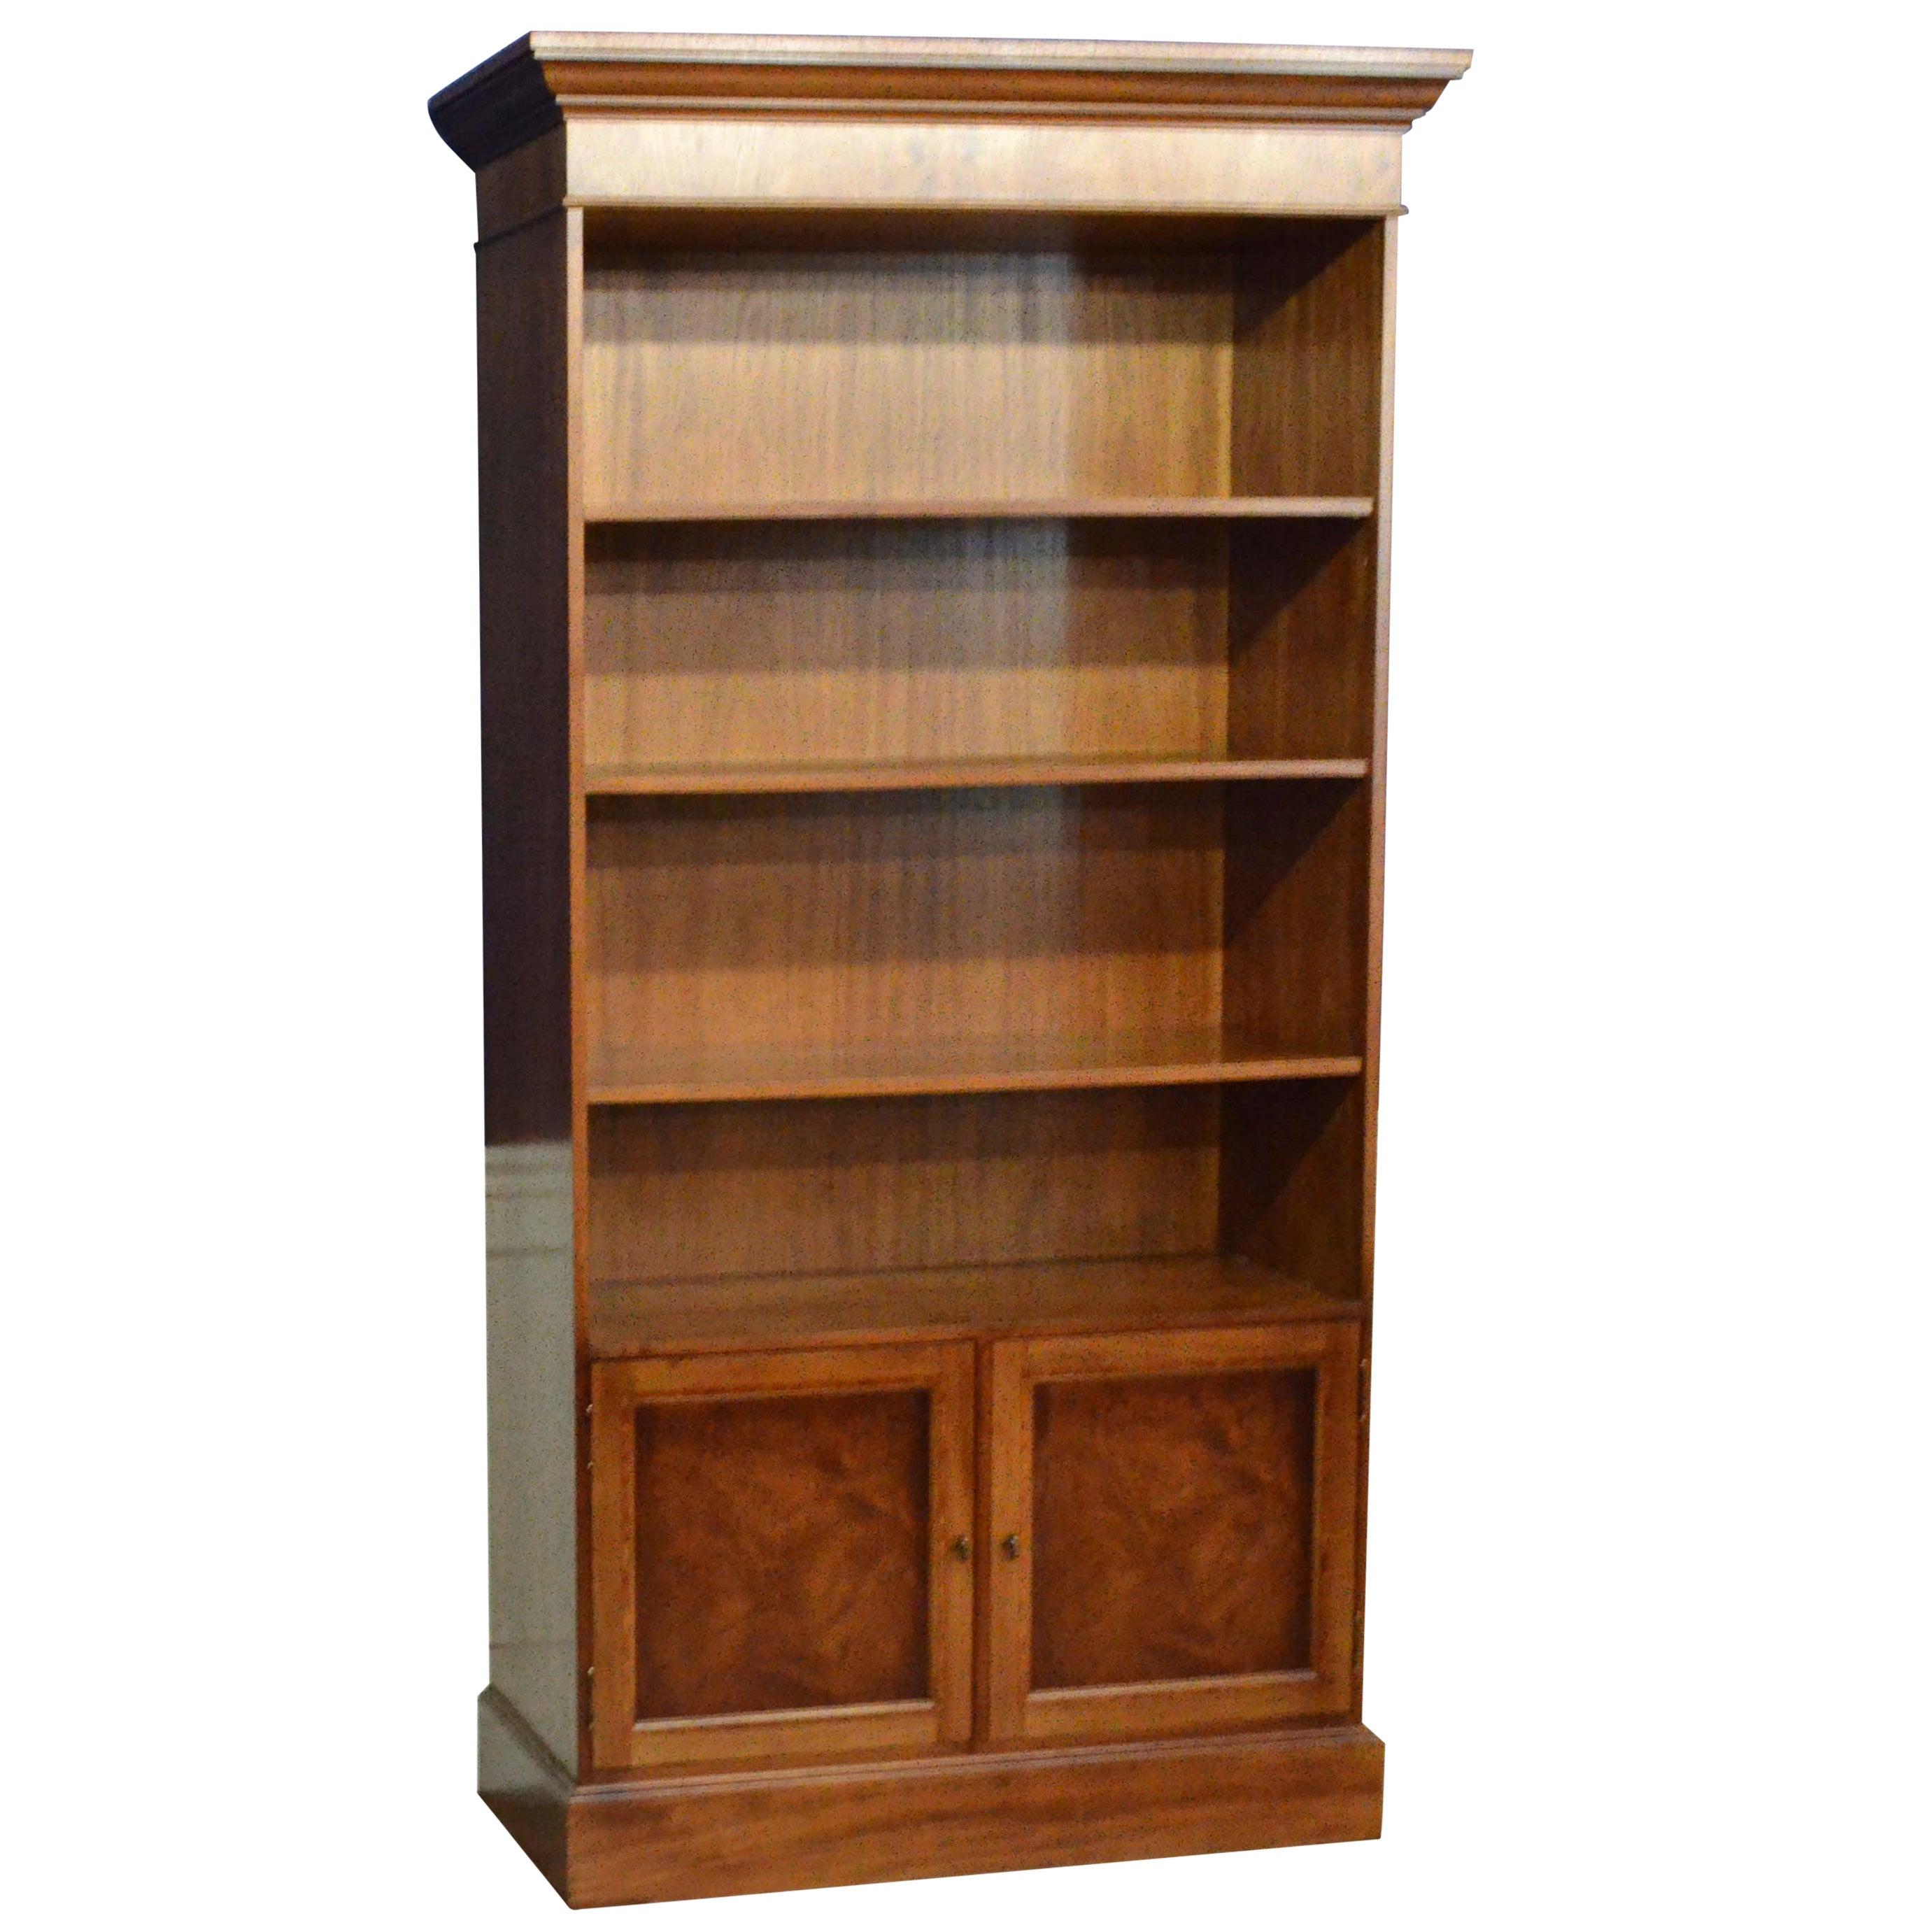 Custom Mahogany Georgian Style Bookcase by Leighton Hall